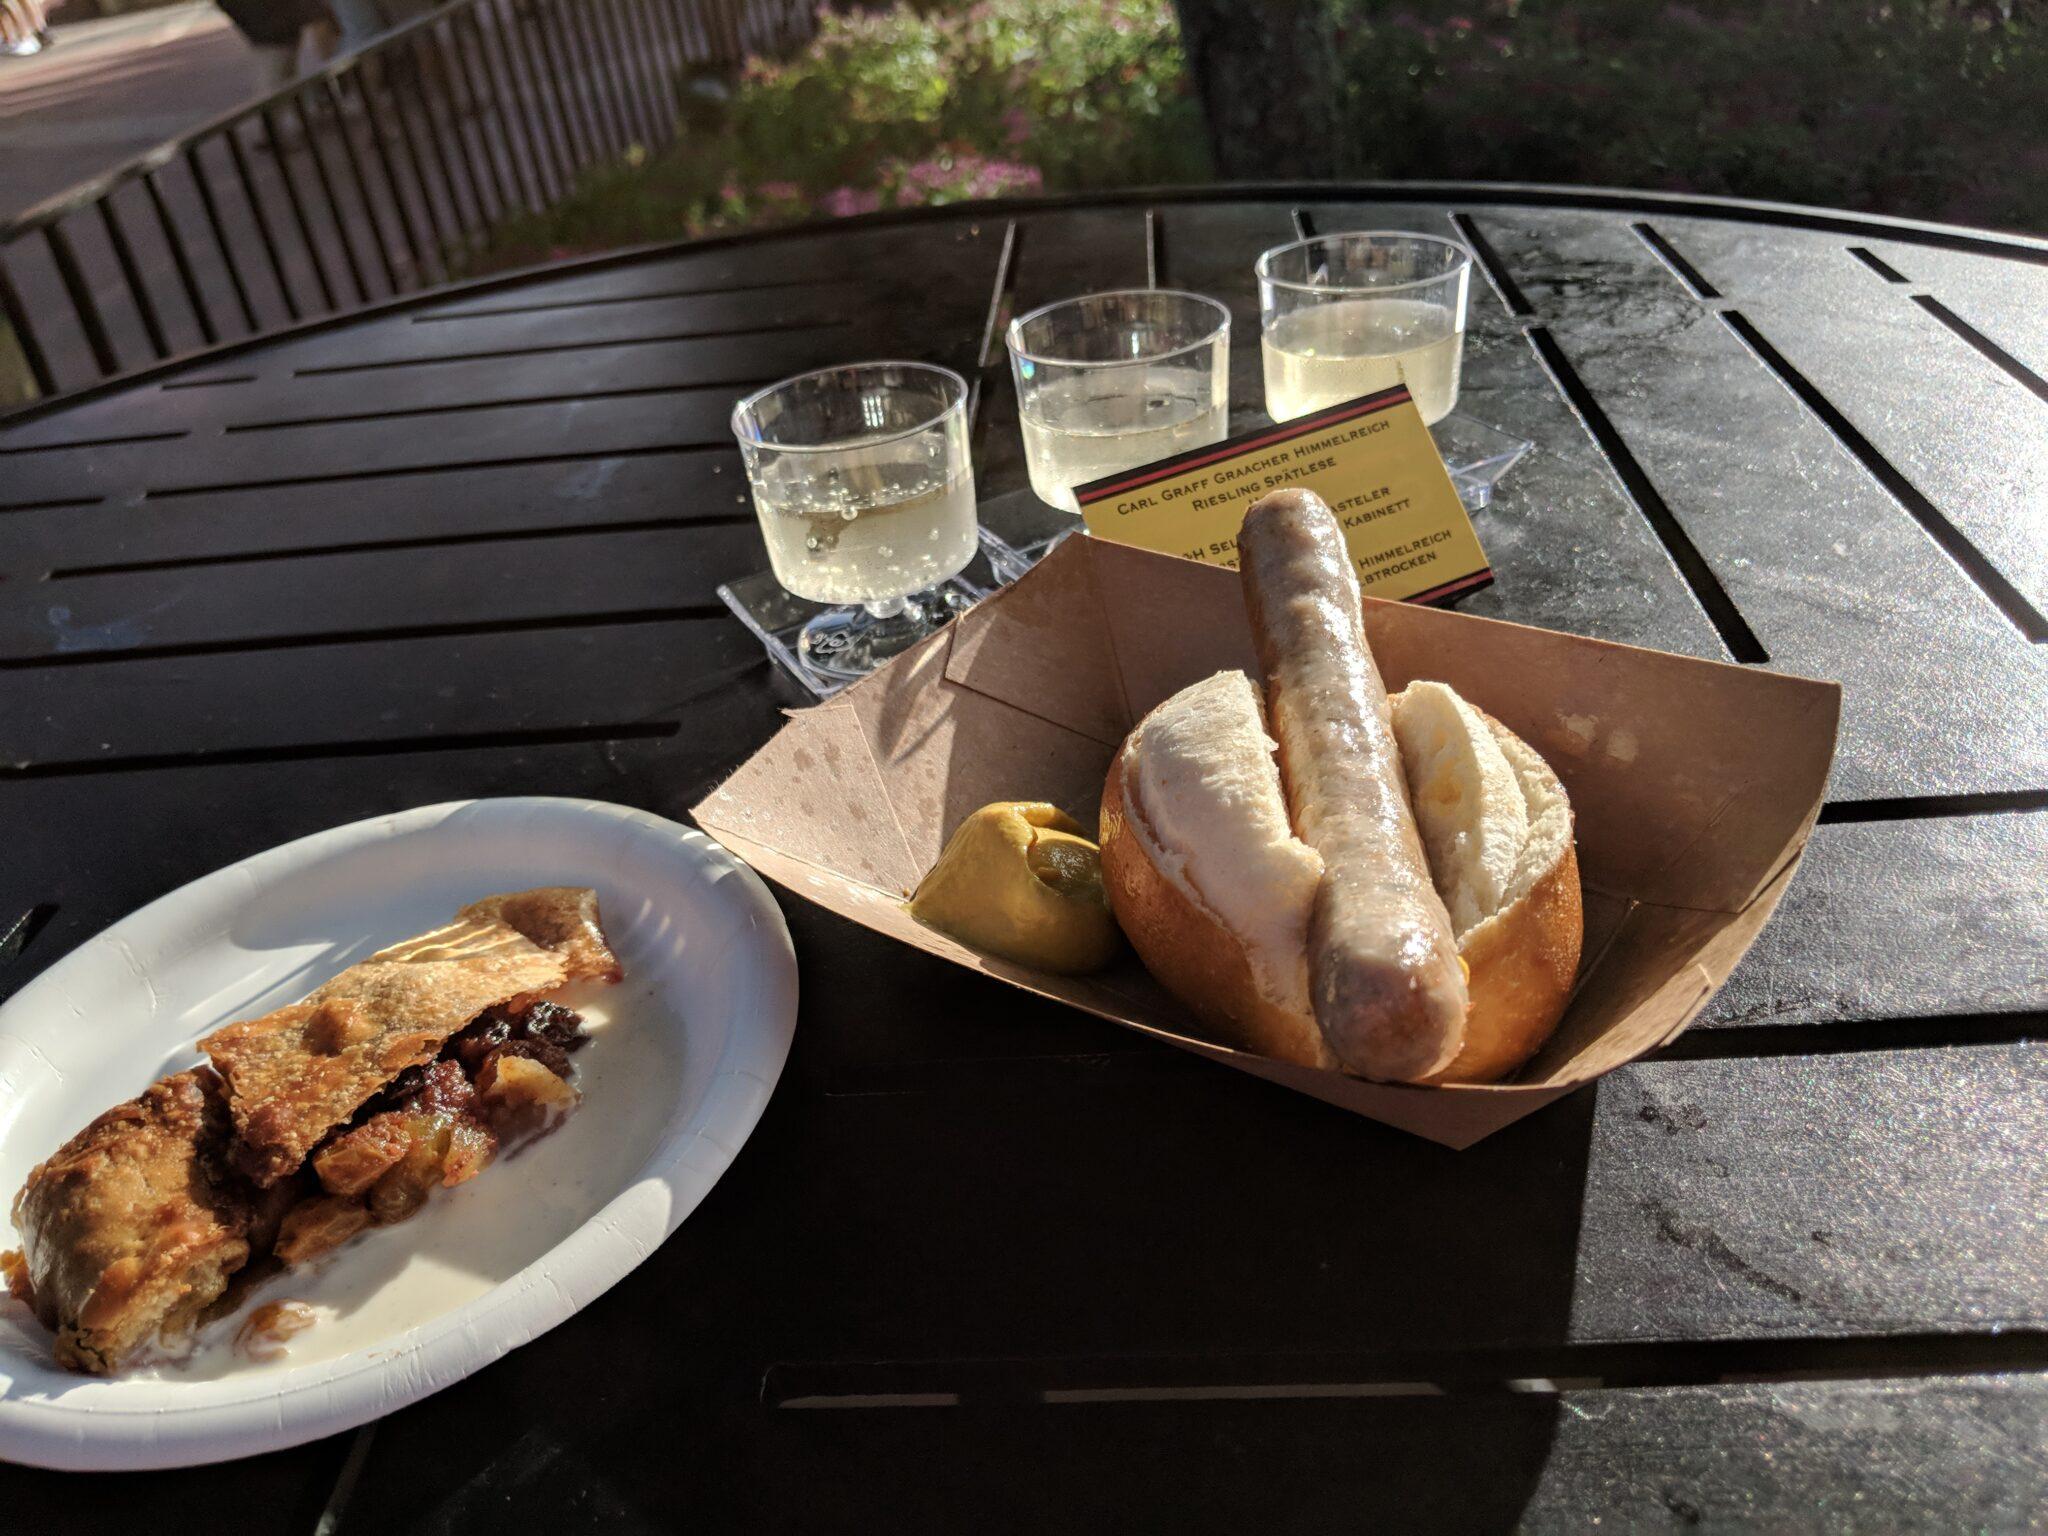 Roast Bratwurst from Epcot Food & Wine Festival.